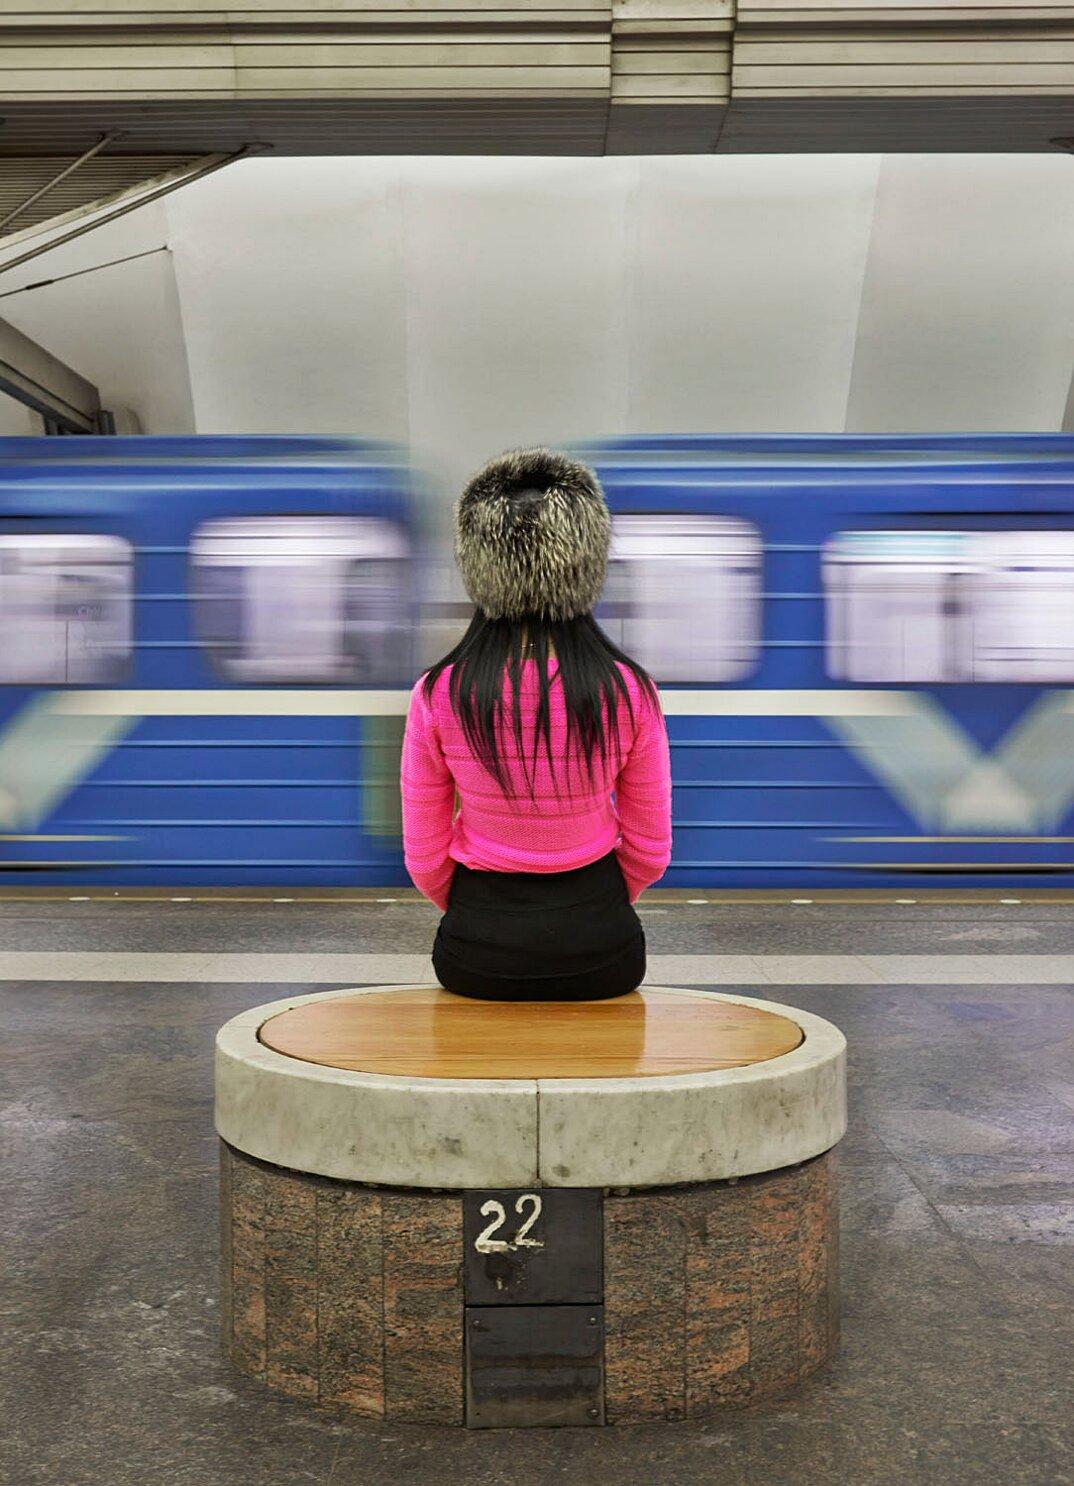 fotografia-russia-scene-surreali-frank-herfort-21